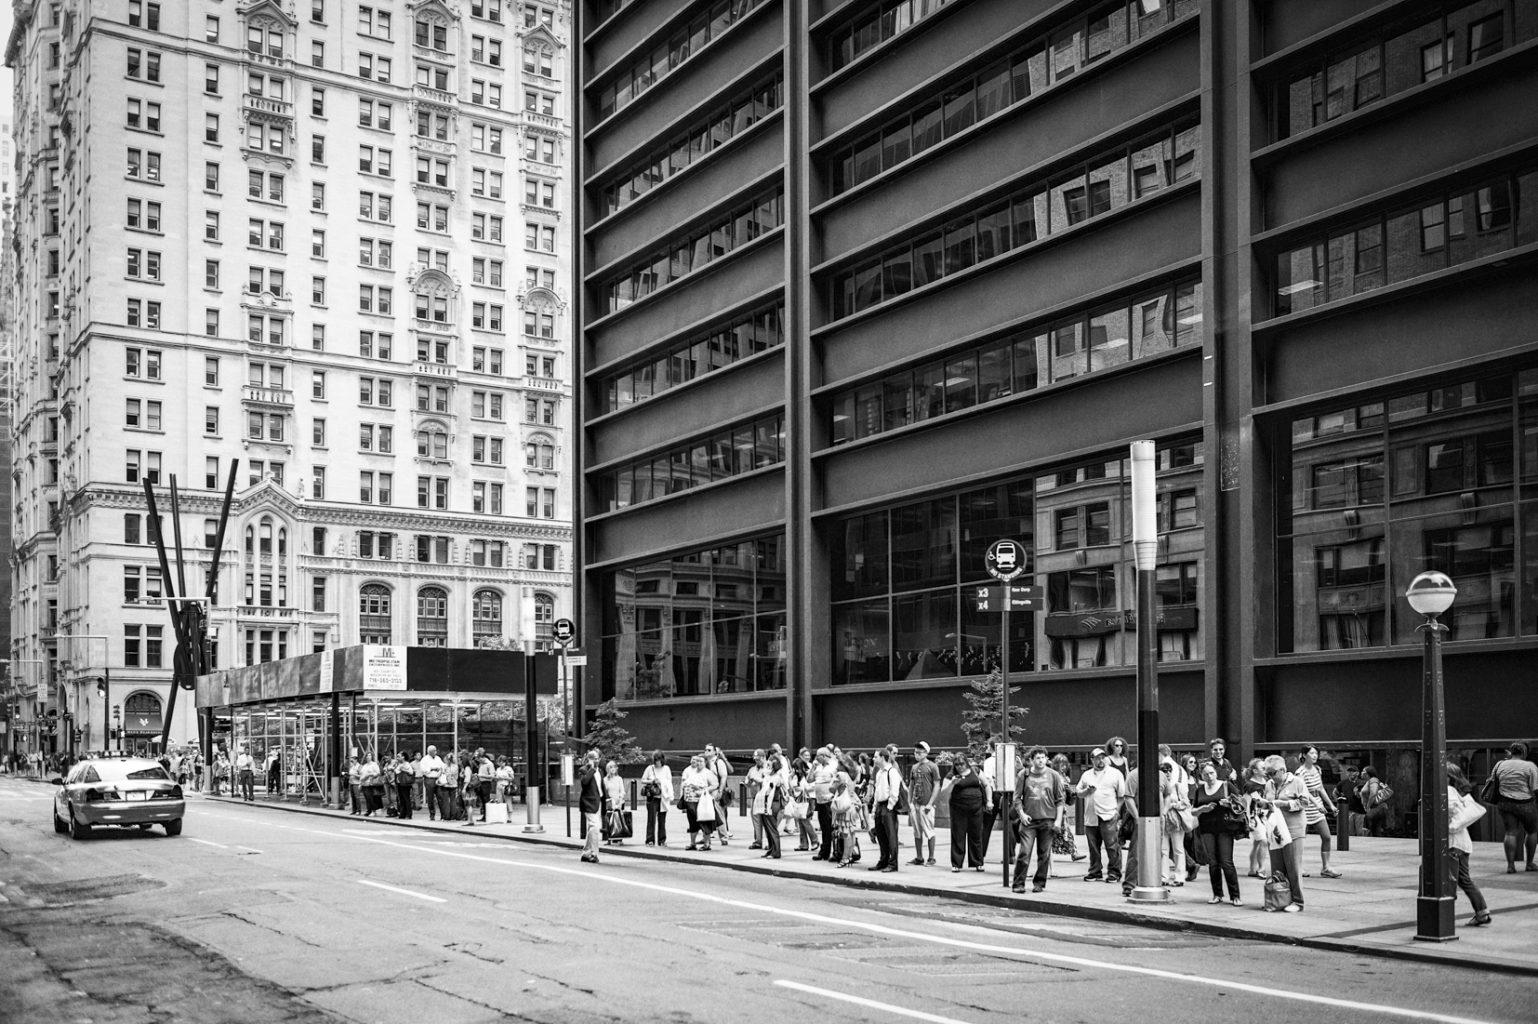 Broadway, Financial District, New York City, 22. Juni 2012